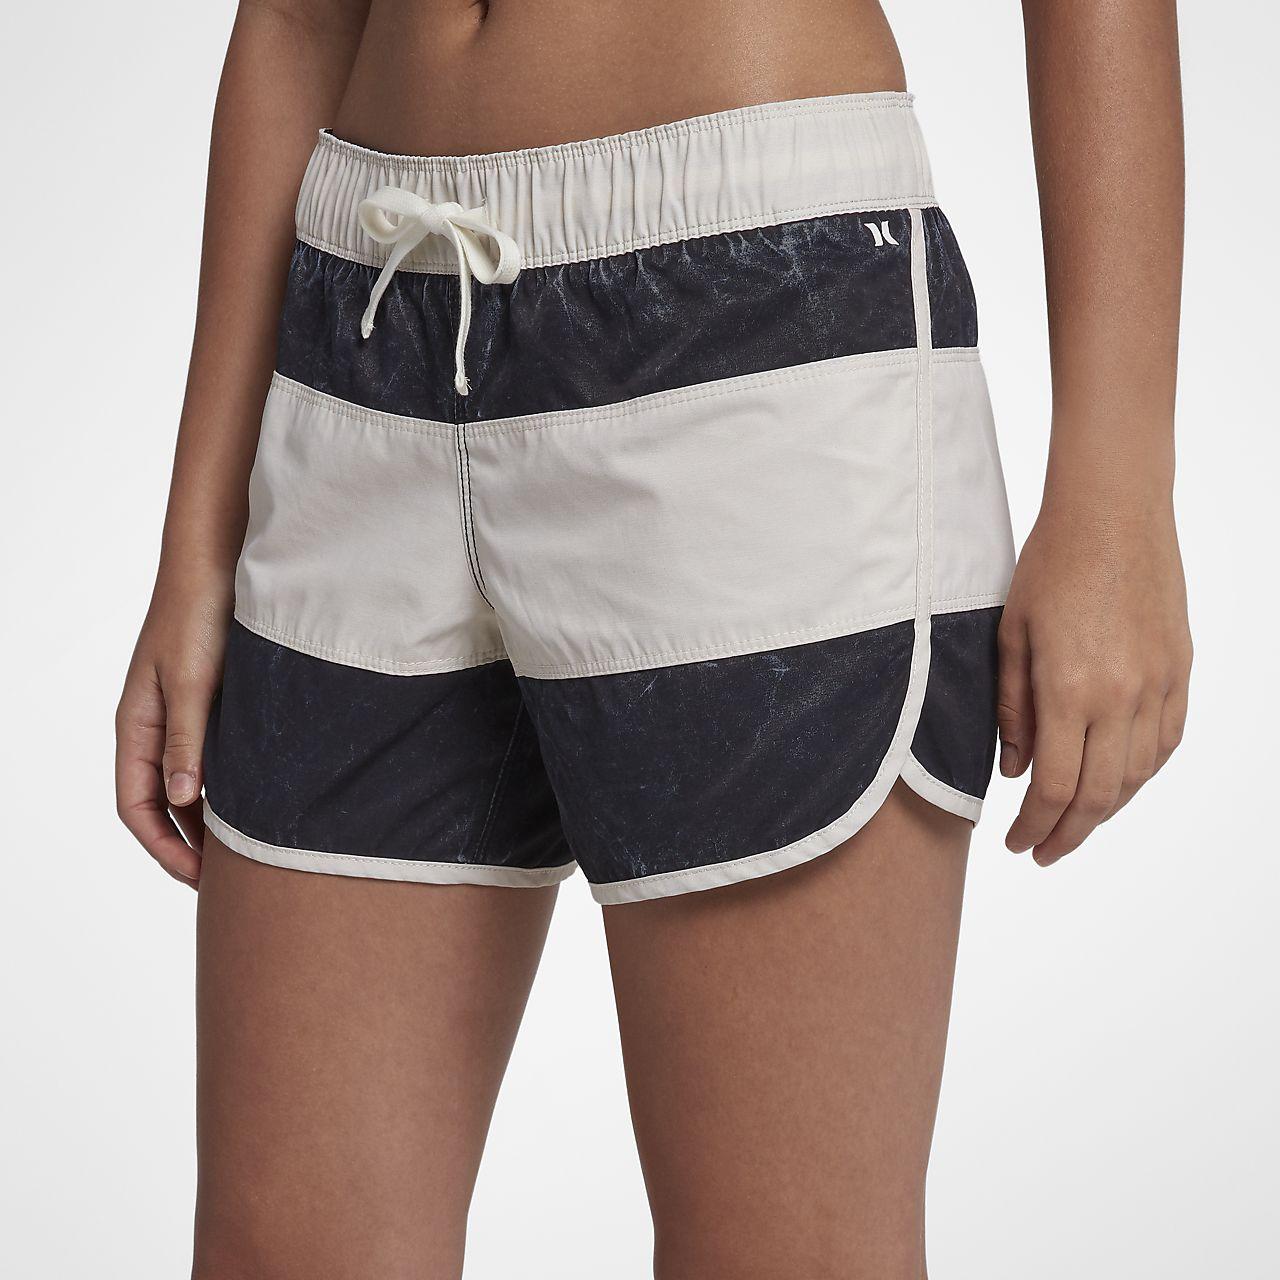 Shorts de playa de 13 cm para mujer Hurley Paneled Wash Beachrider